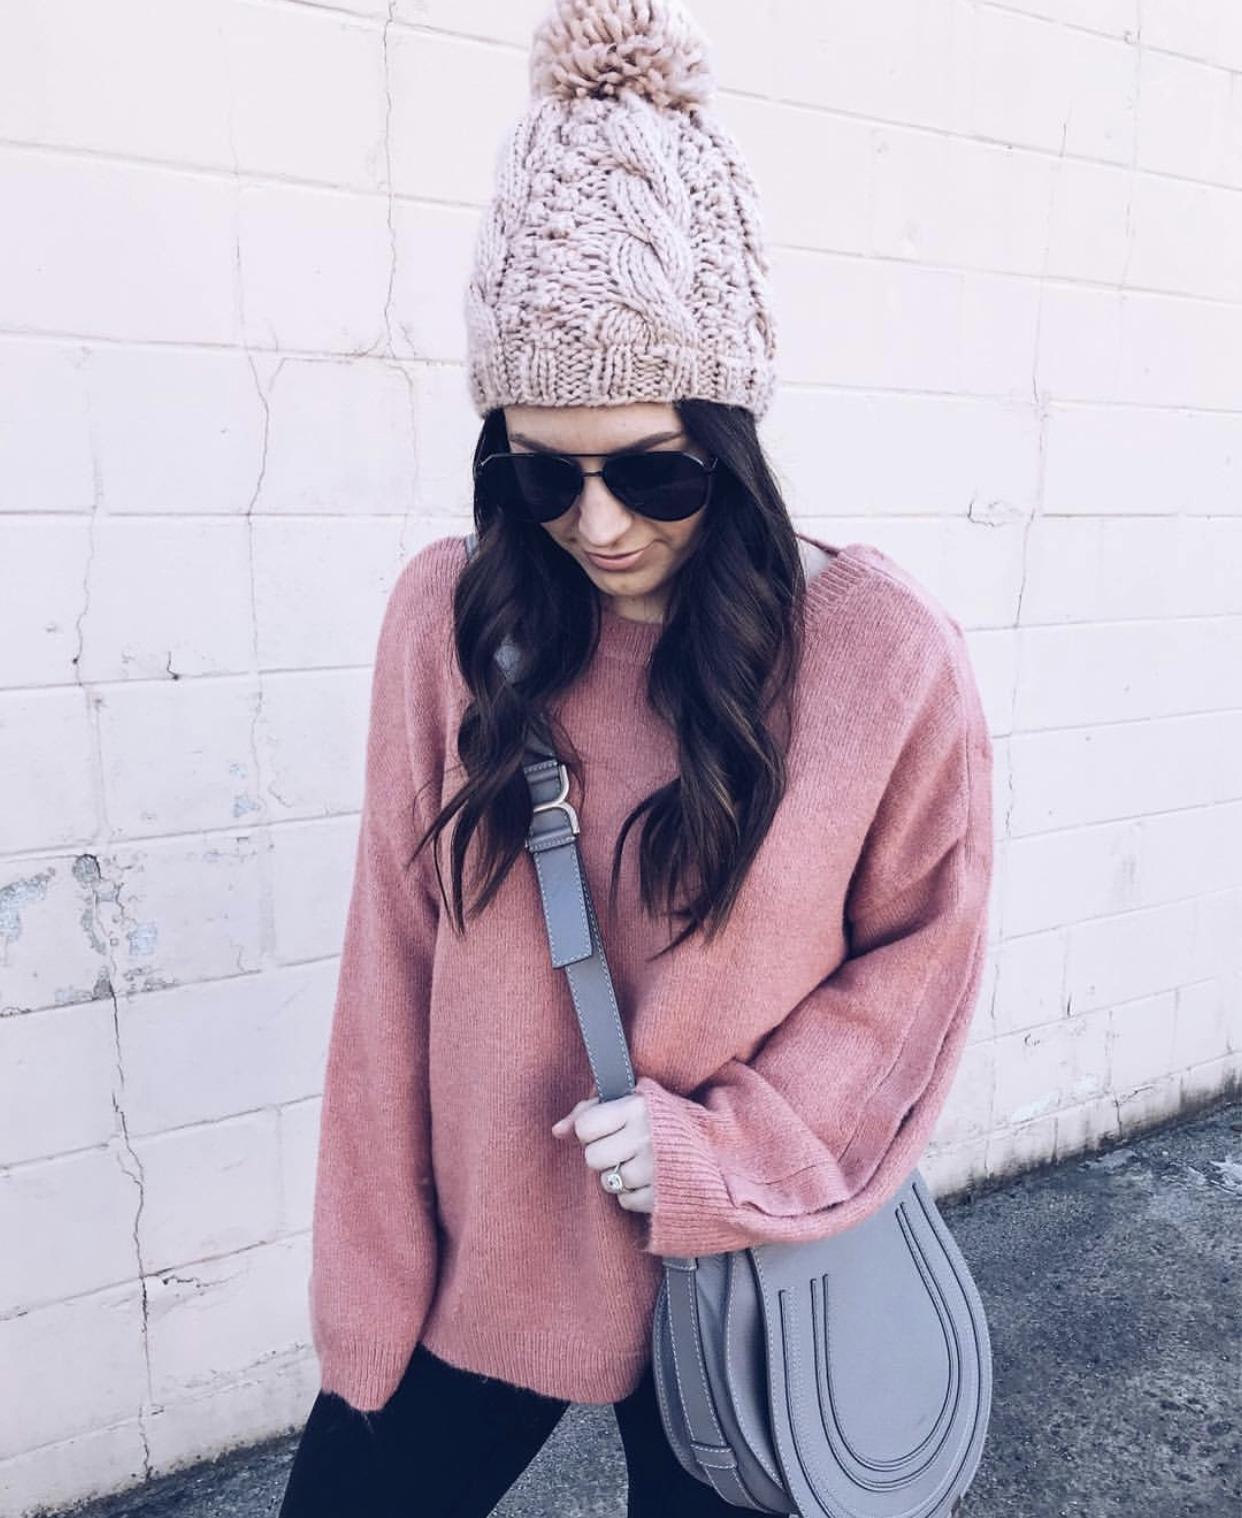 Chloé Marcie Medium Leather Crossbody Bag Review | Pine Barren Beauty | designer handbag review, must have designer bag, Chloé bag